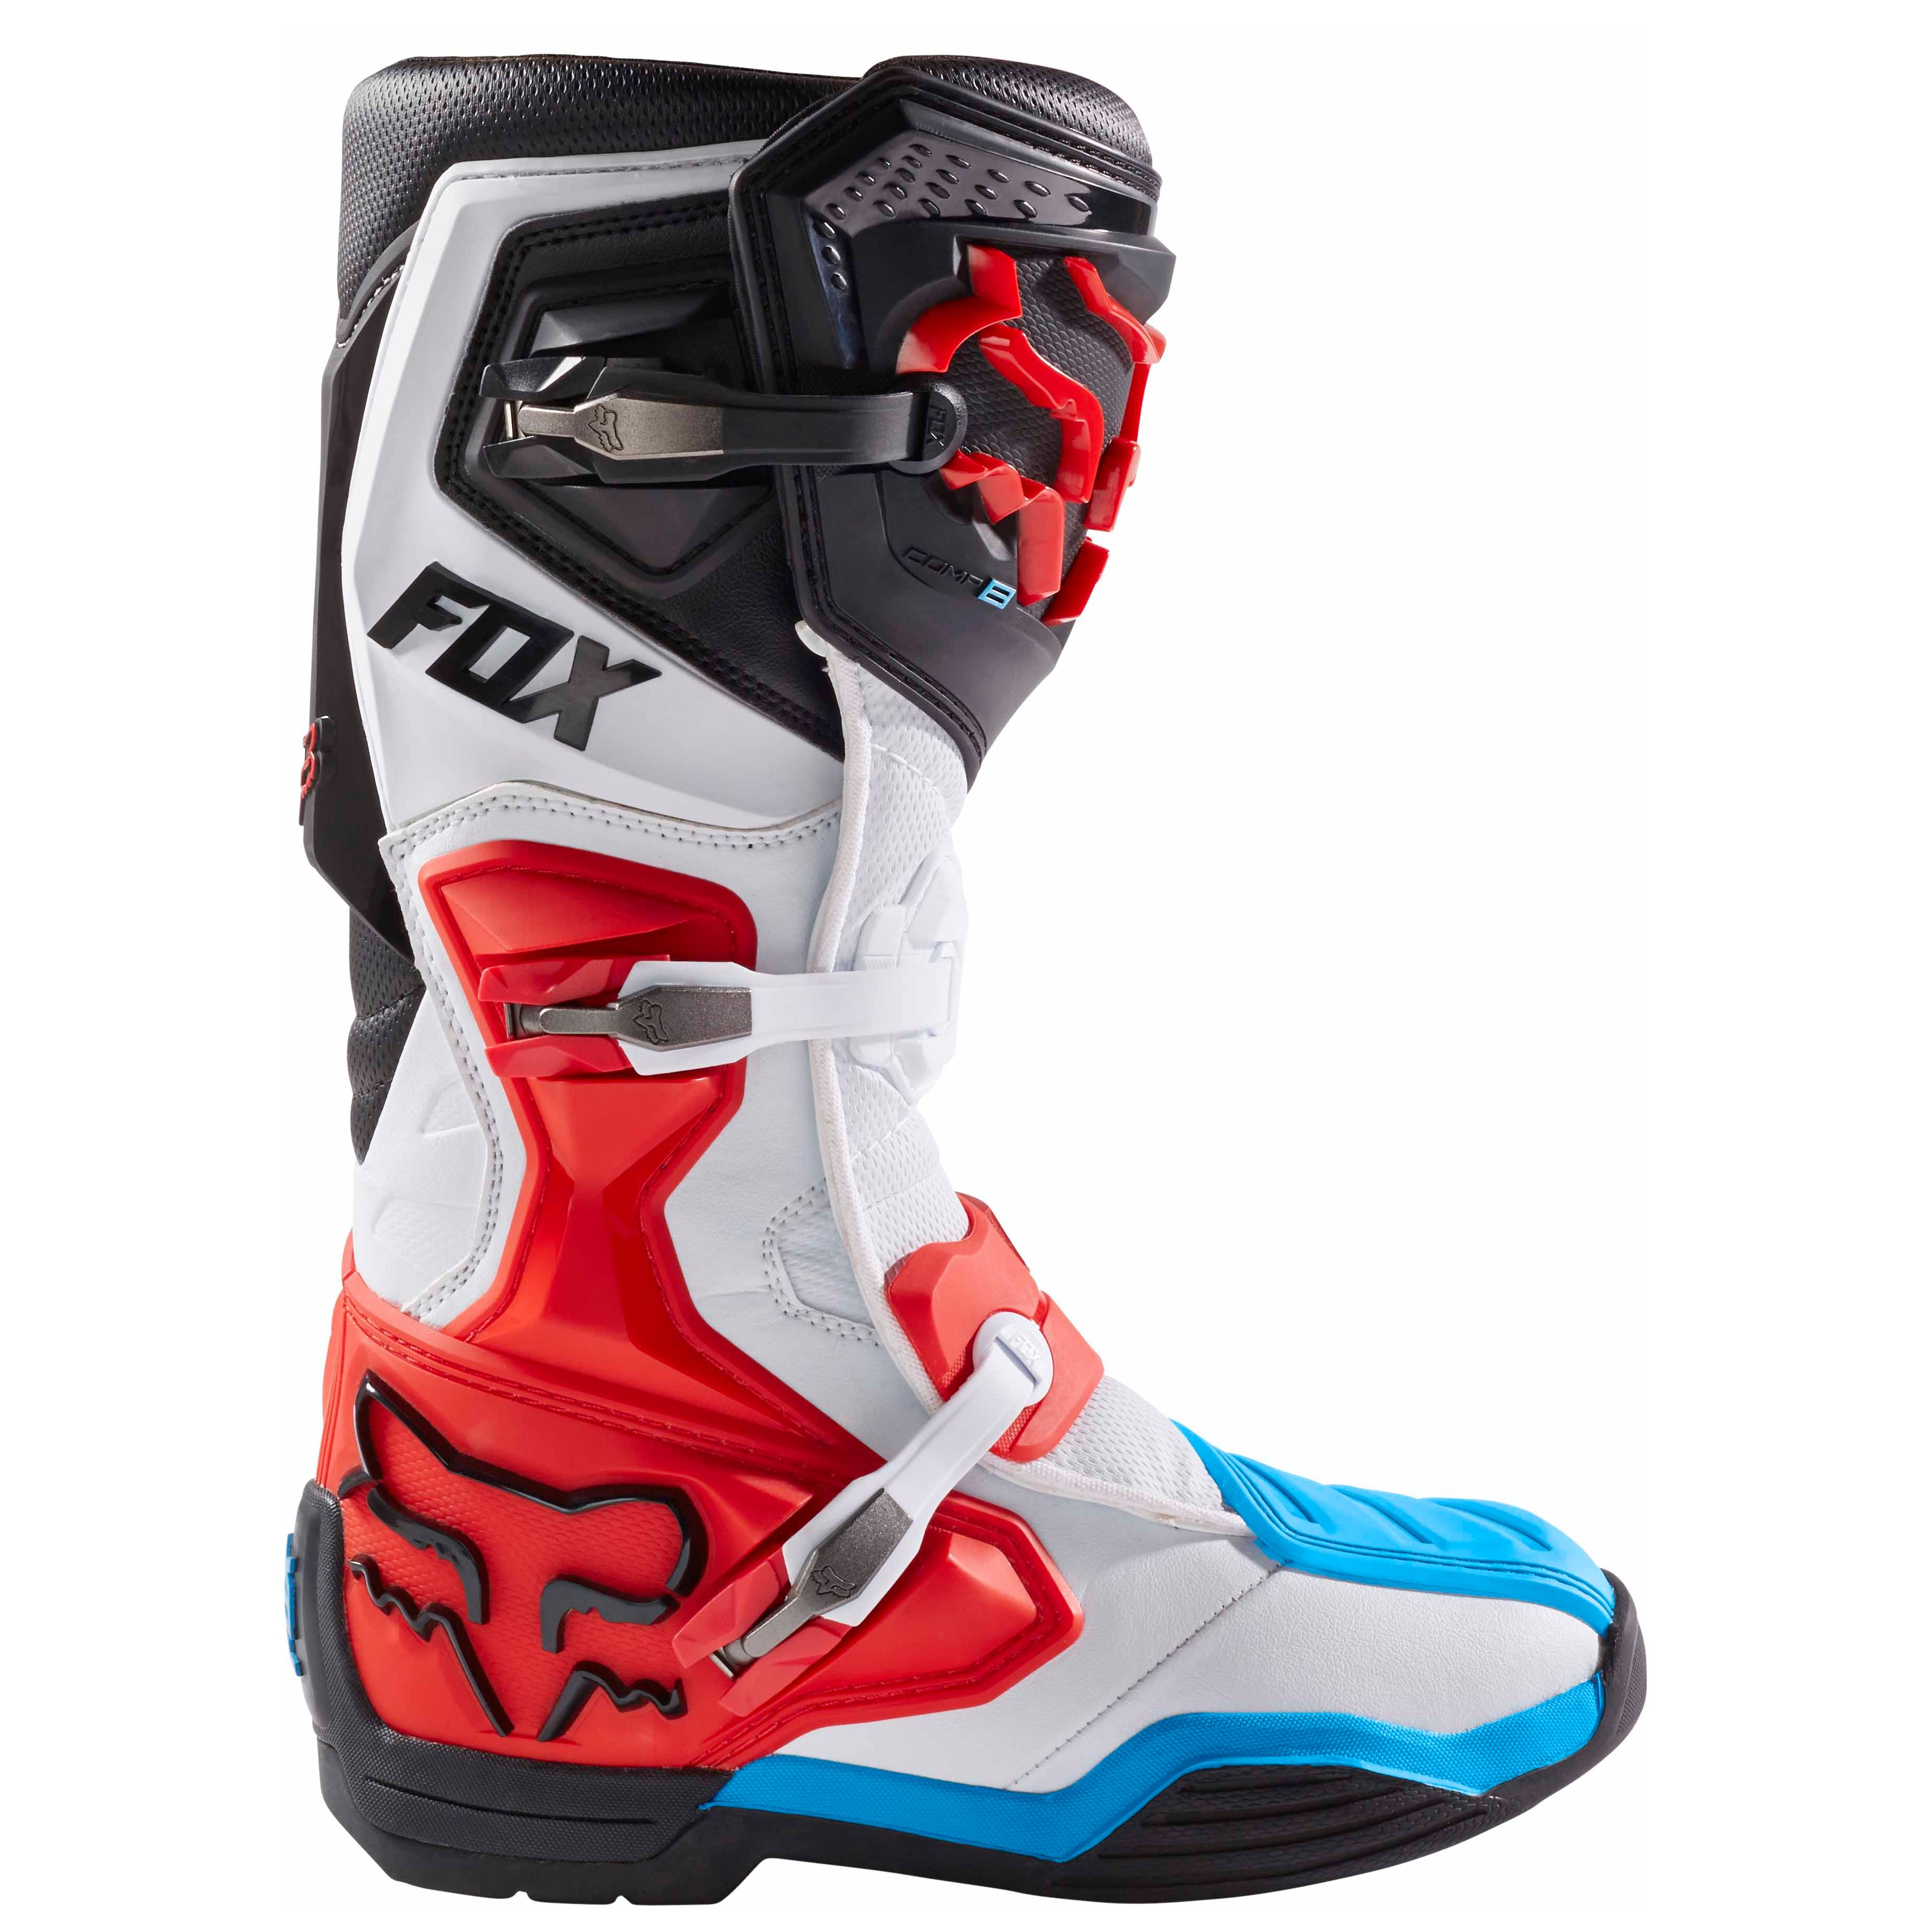 bottes destockage enduro moto 1 bottes tcx pro2 cross cross Fl1T3KcJ